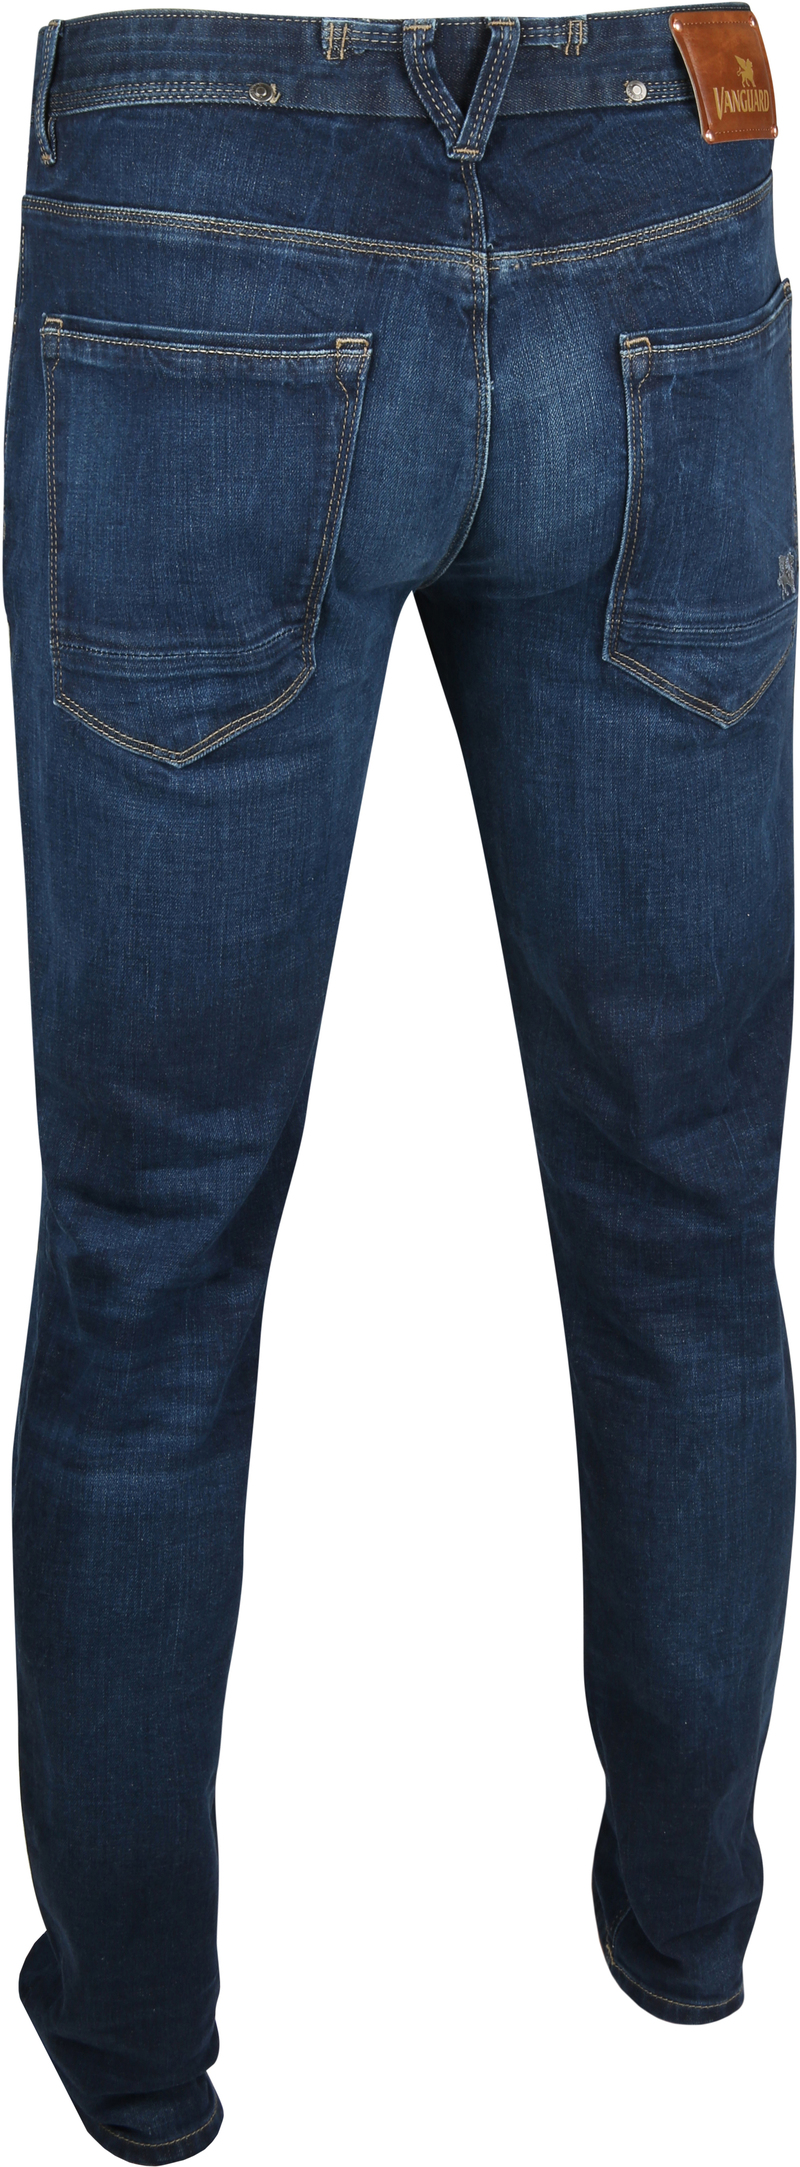 Vanguard Jeans V7 Rider Pure Blue foto 3